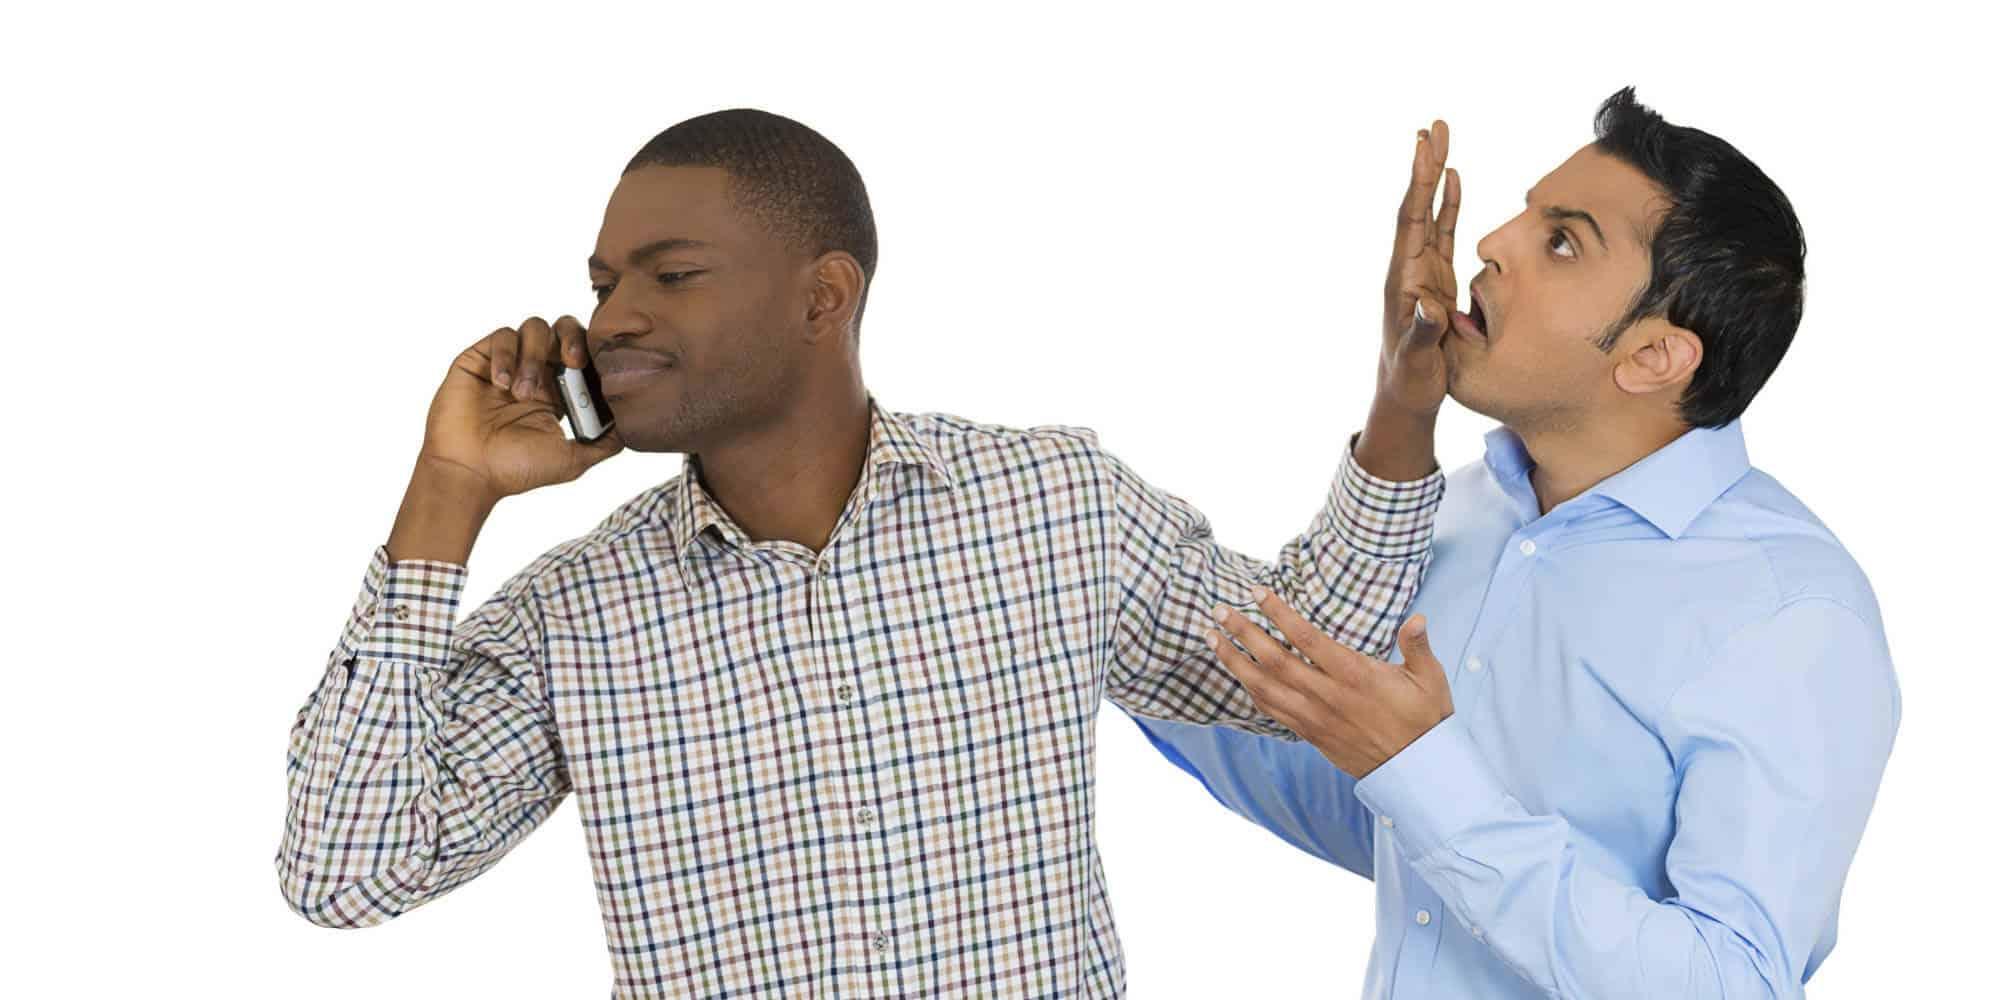 Cell phone interruptions u2013 people before phones, we say